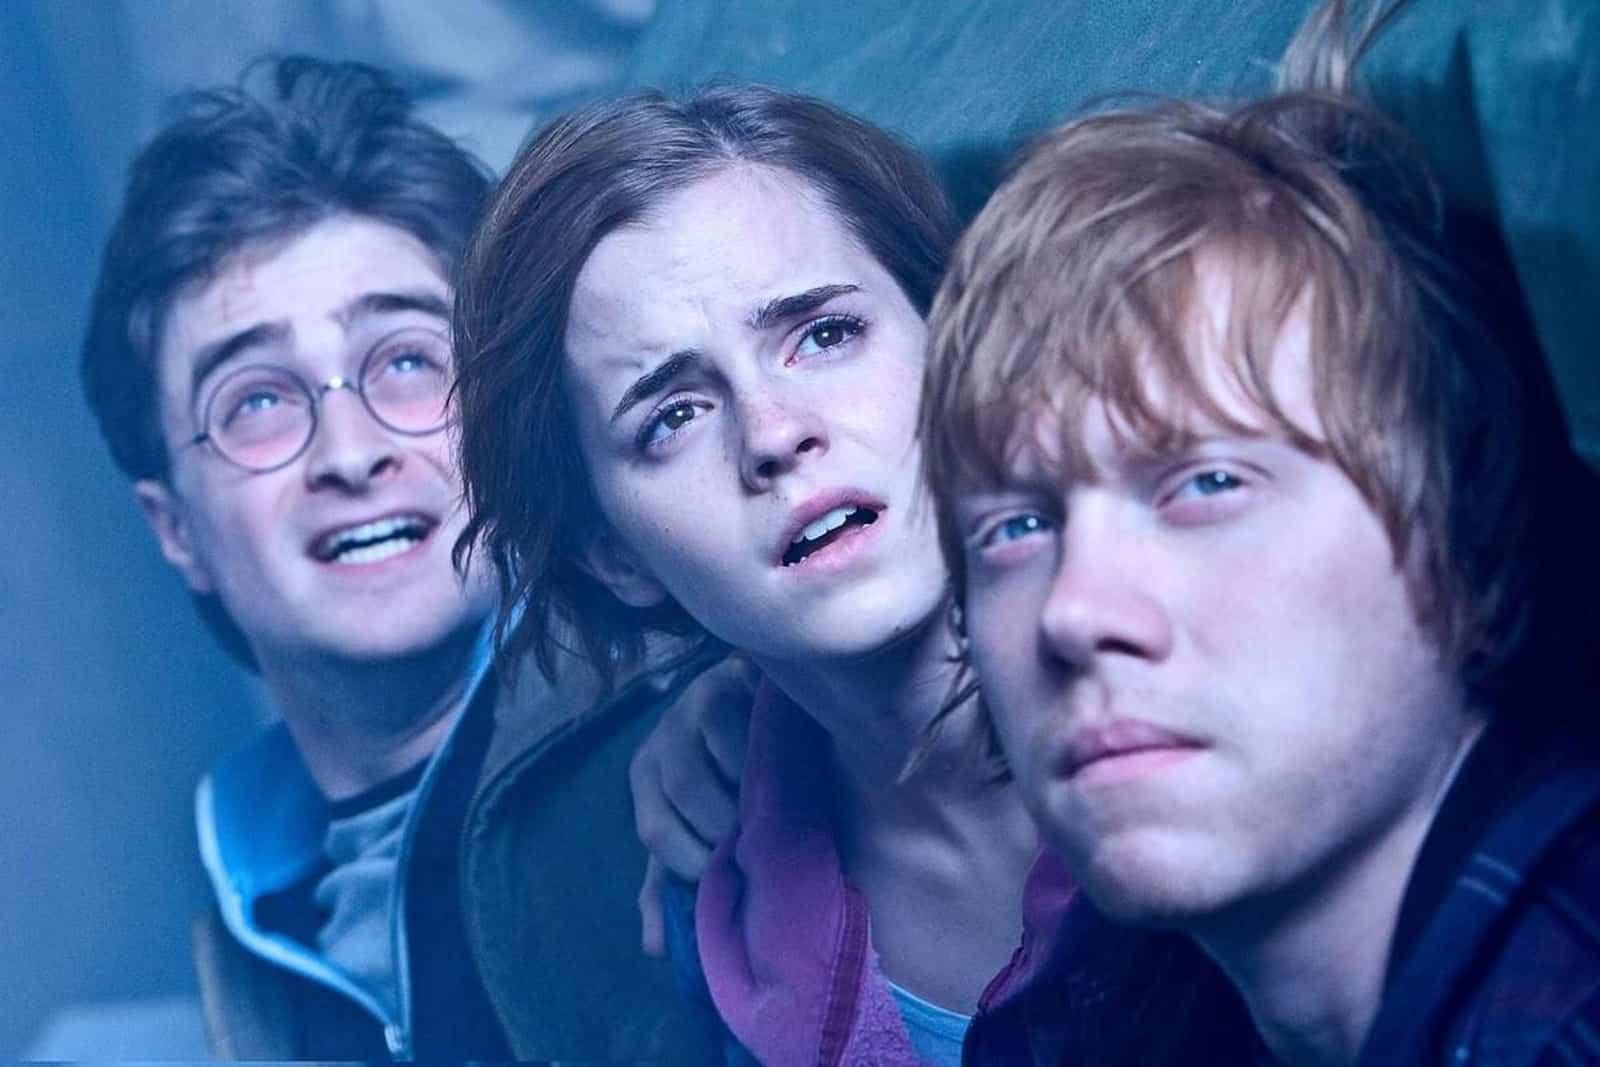 The Harry Potter series filmed at Warner Bros. Leavesden Studios